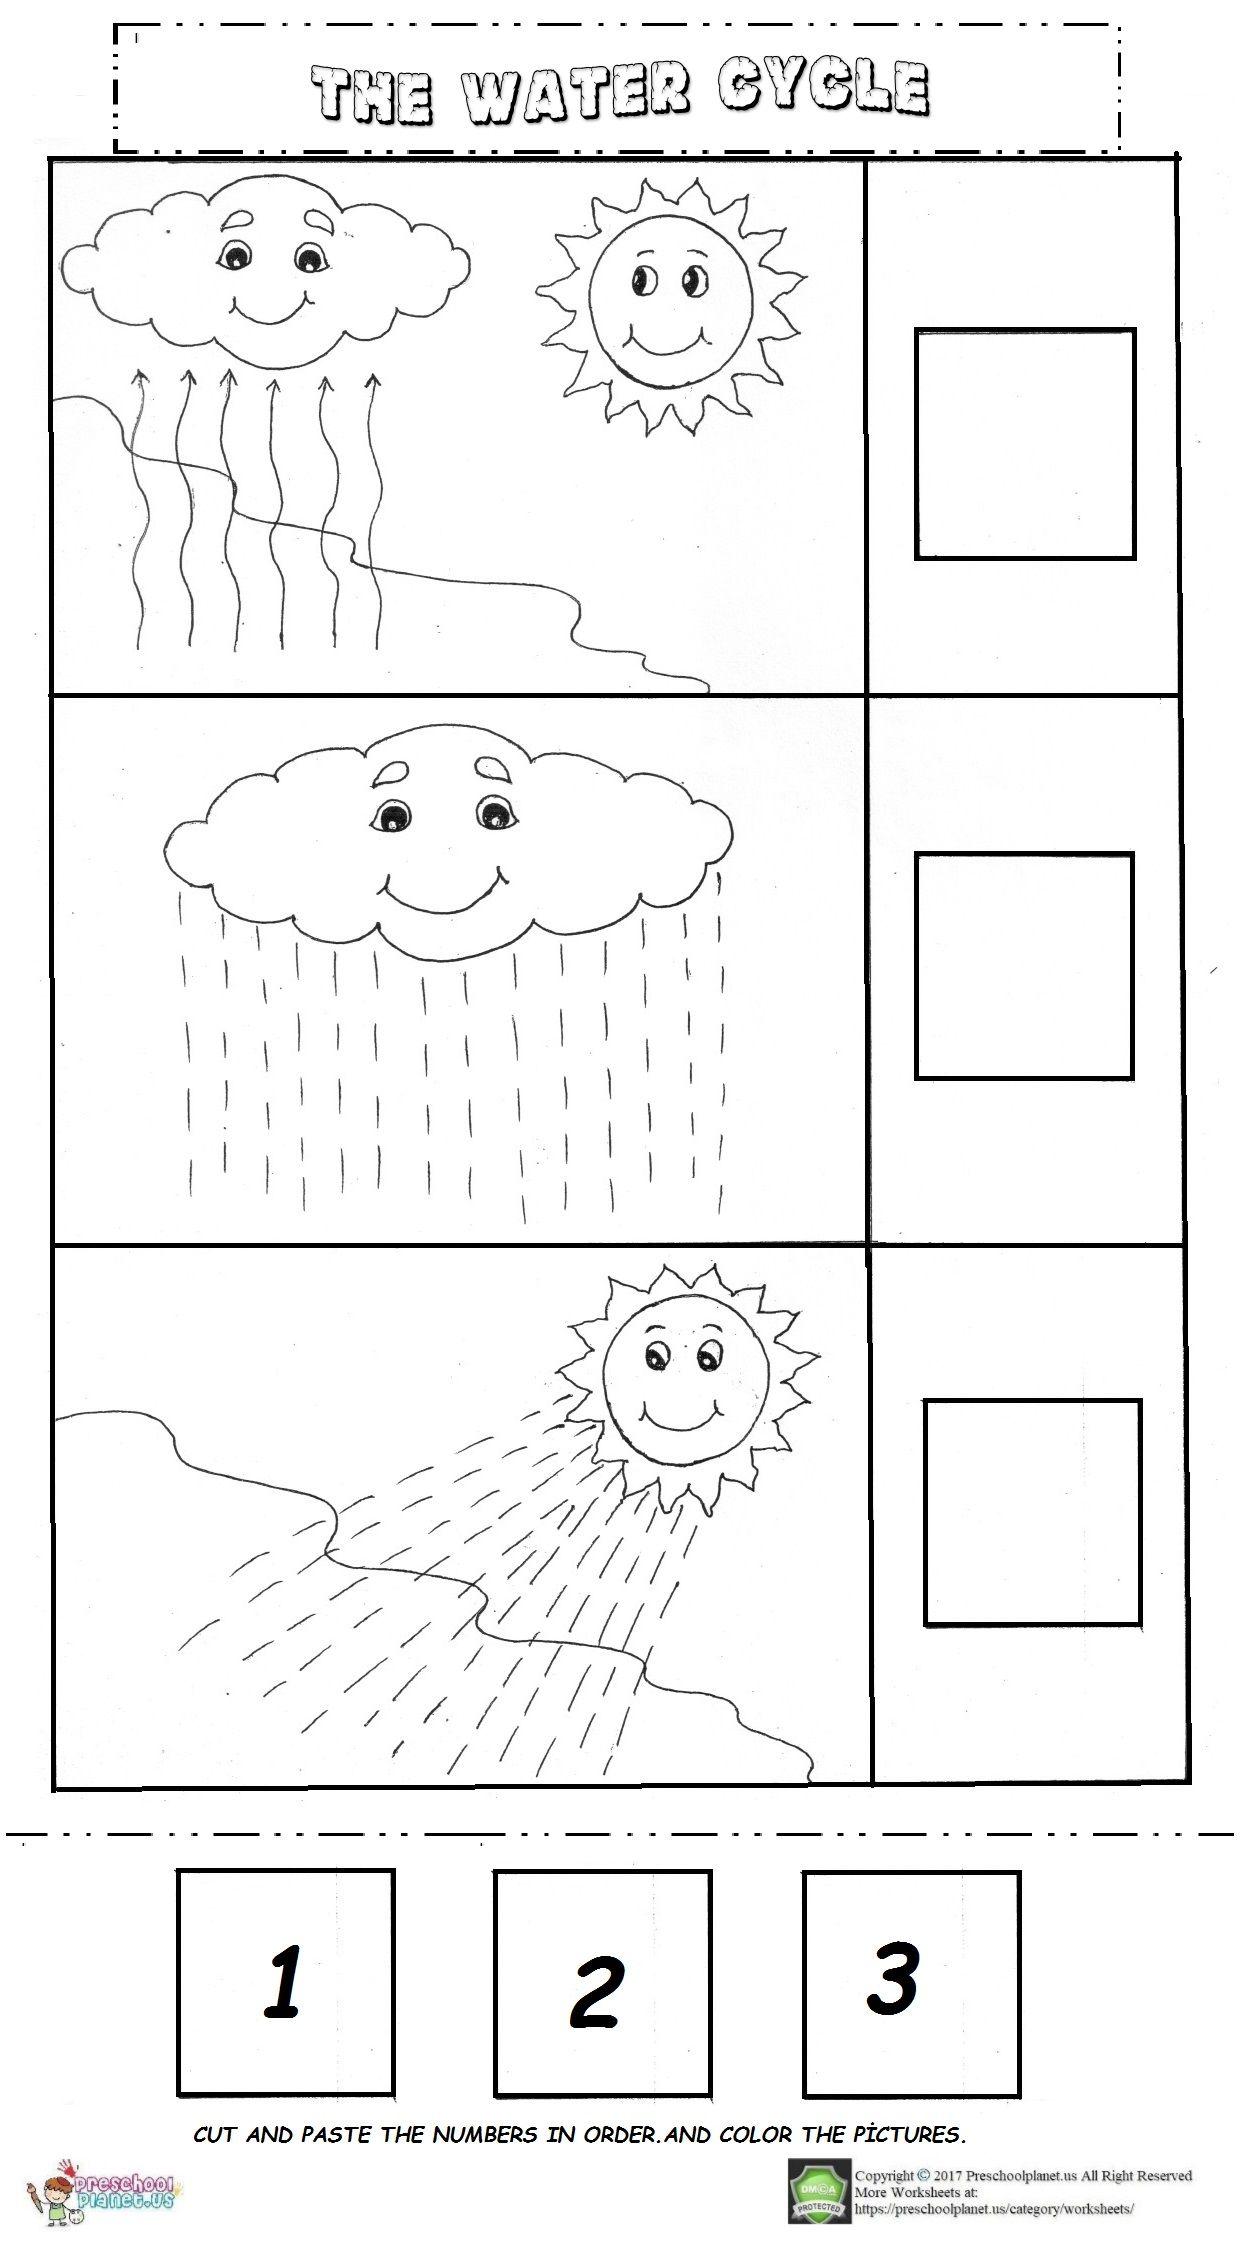 The water cycle worksheet | Worksheet for kids | Water cycle ...